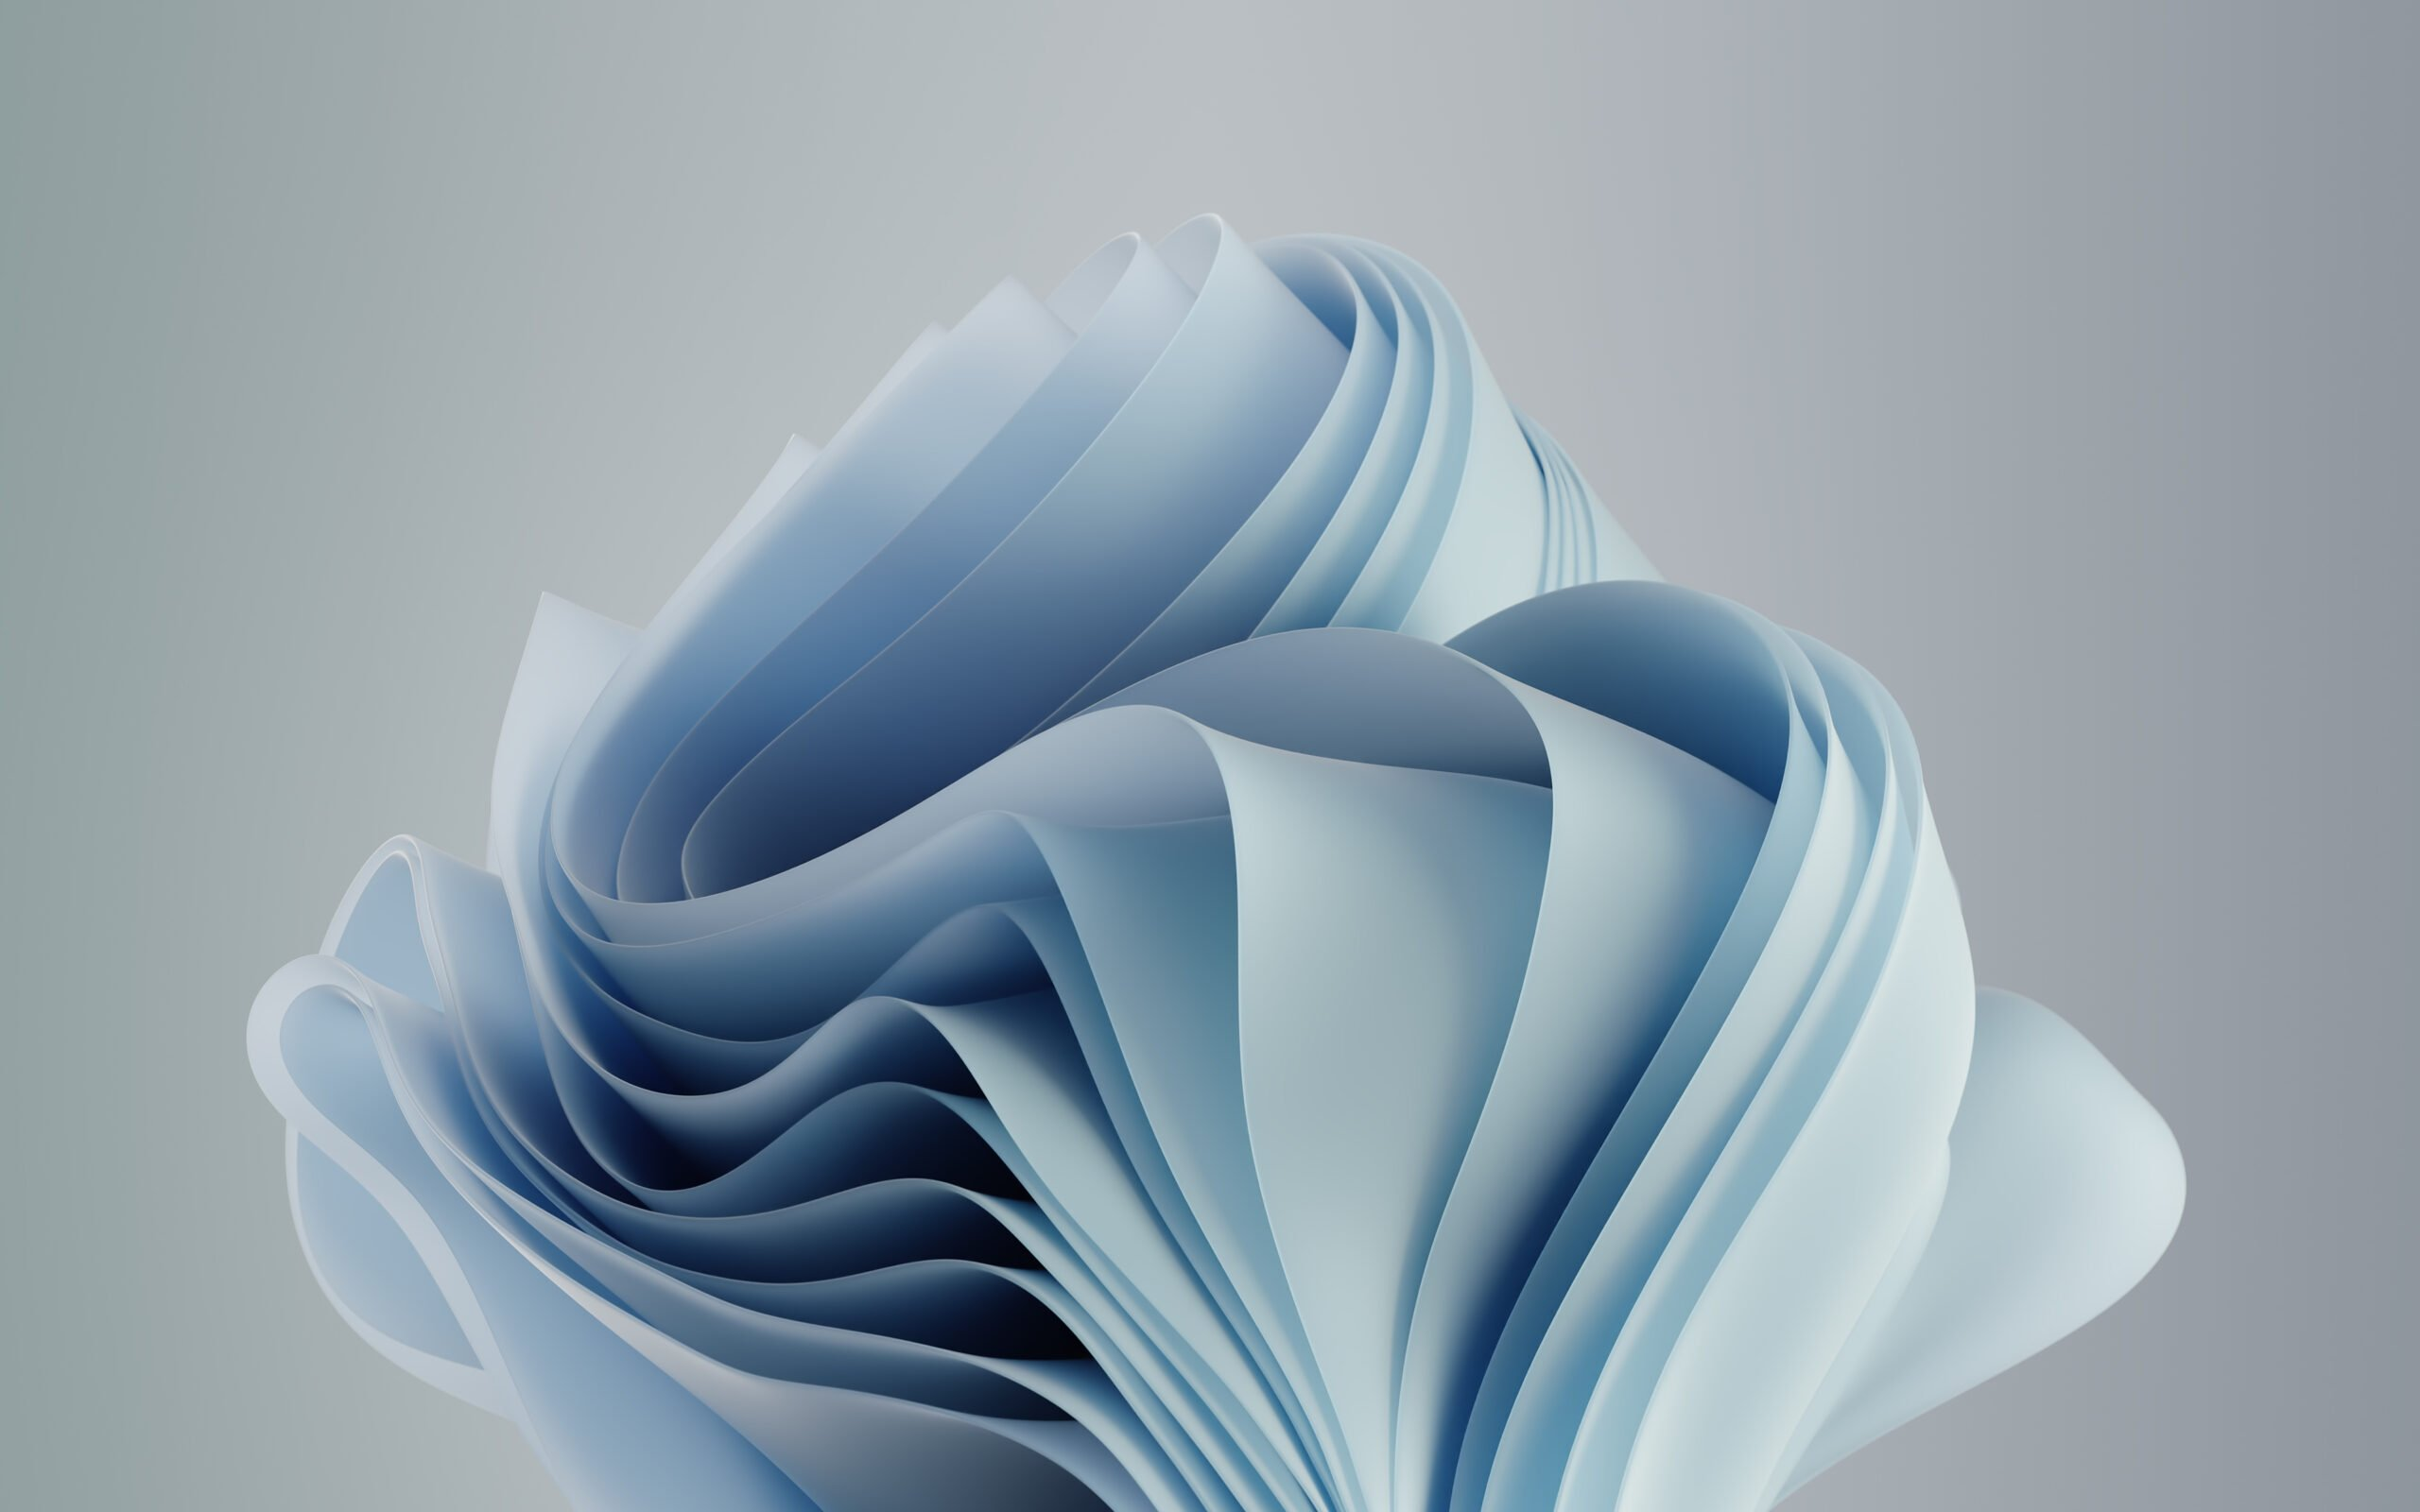 Windows 11 - Flow Theme Image - Microsoft